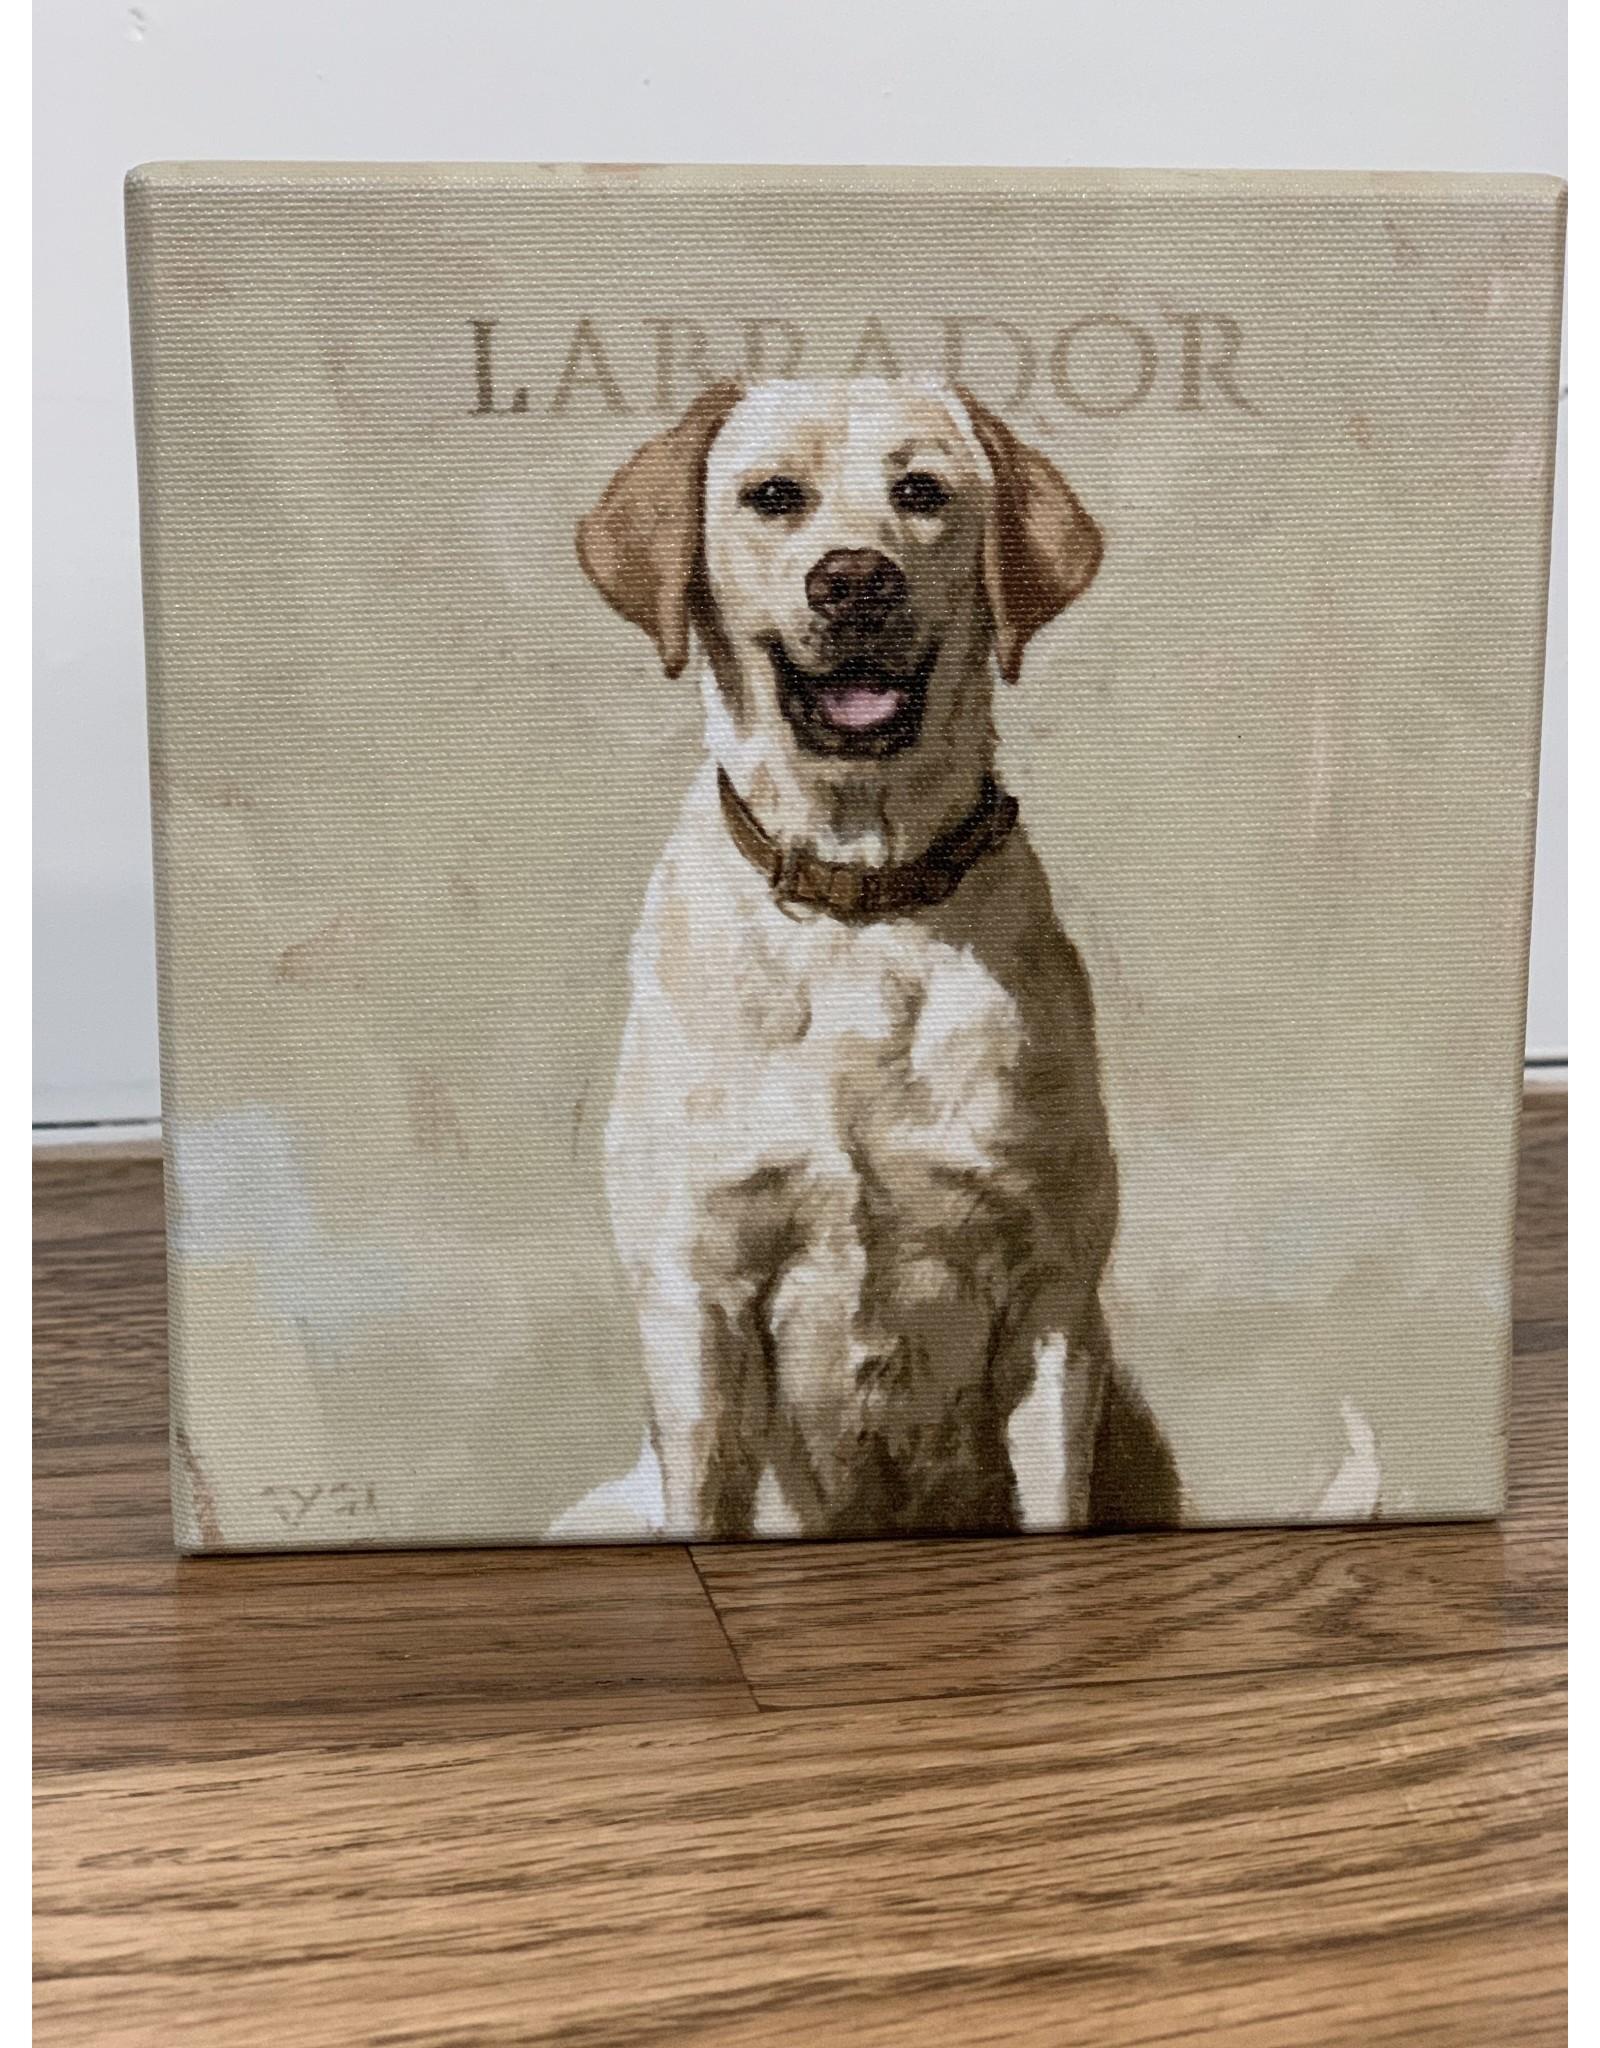 Sullivans Darren Gygi Dog Wall Art 5 x 5